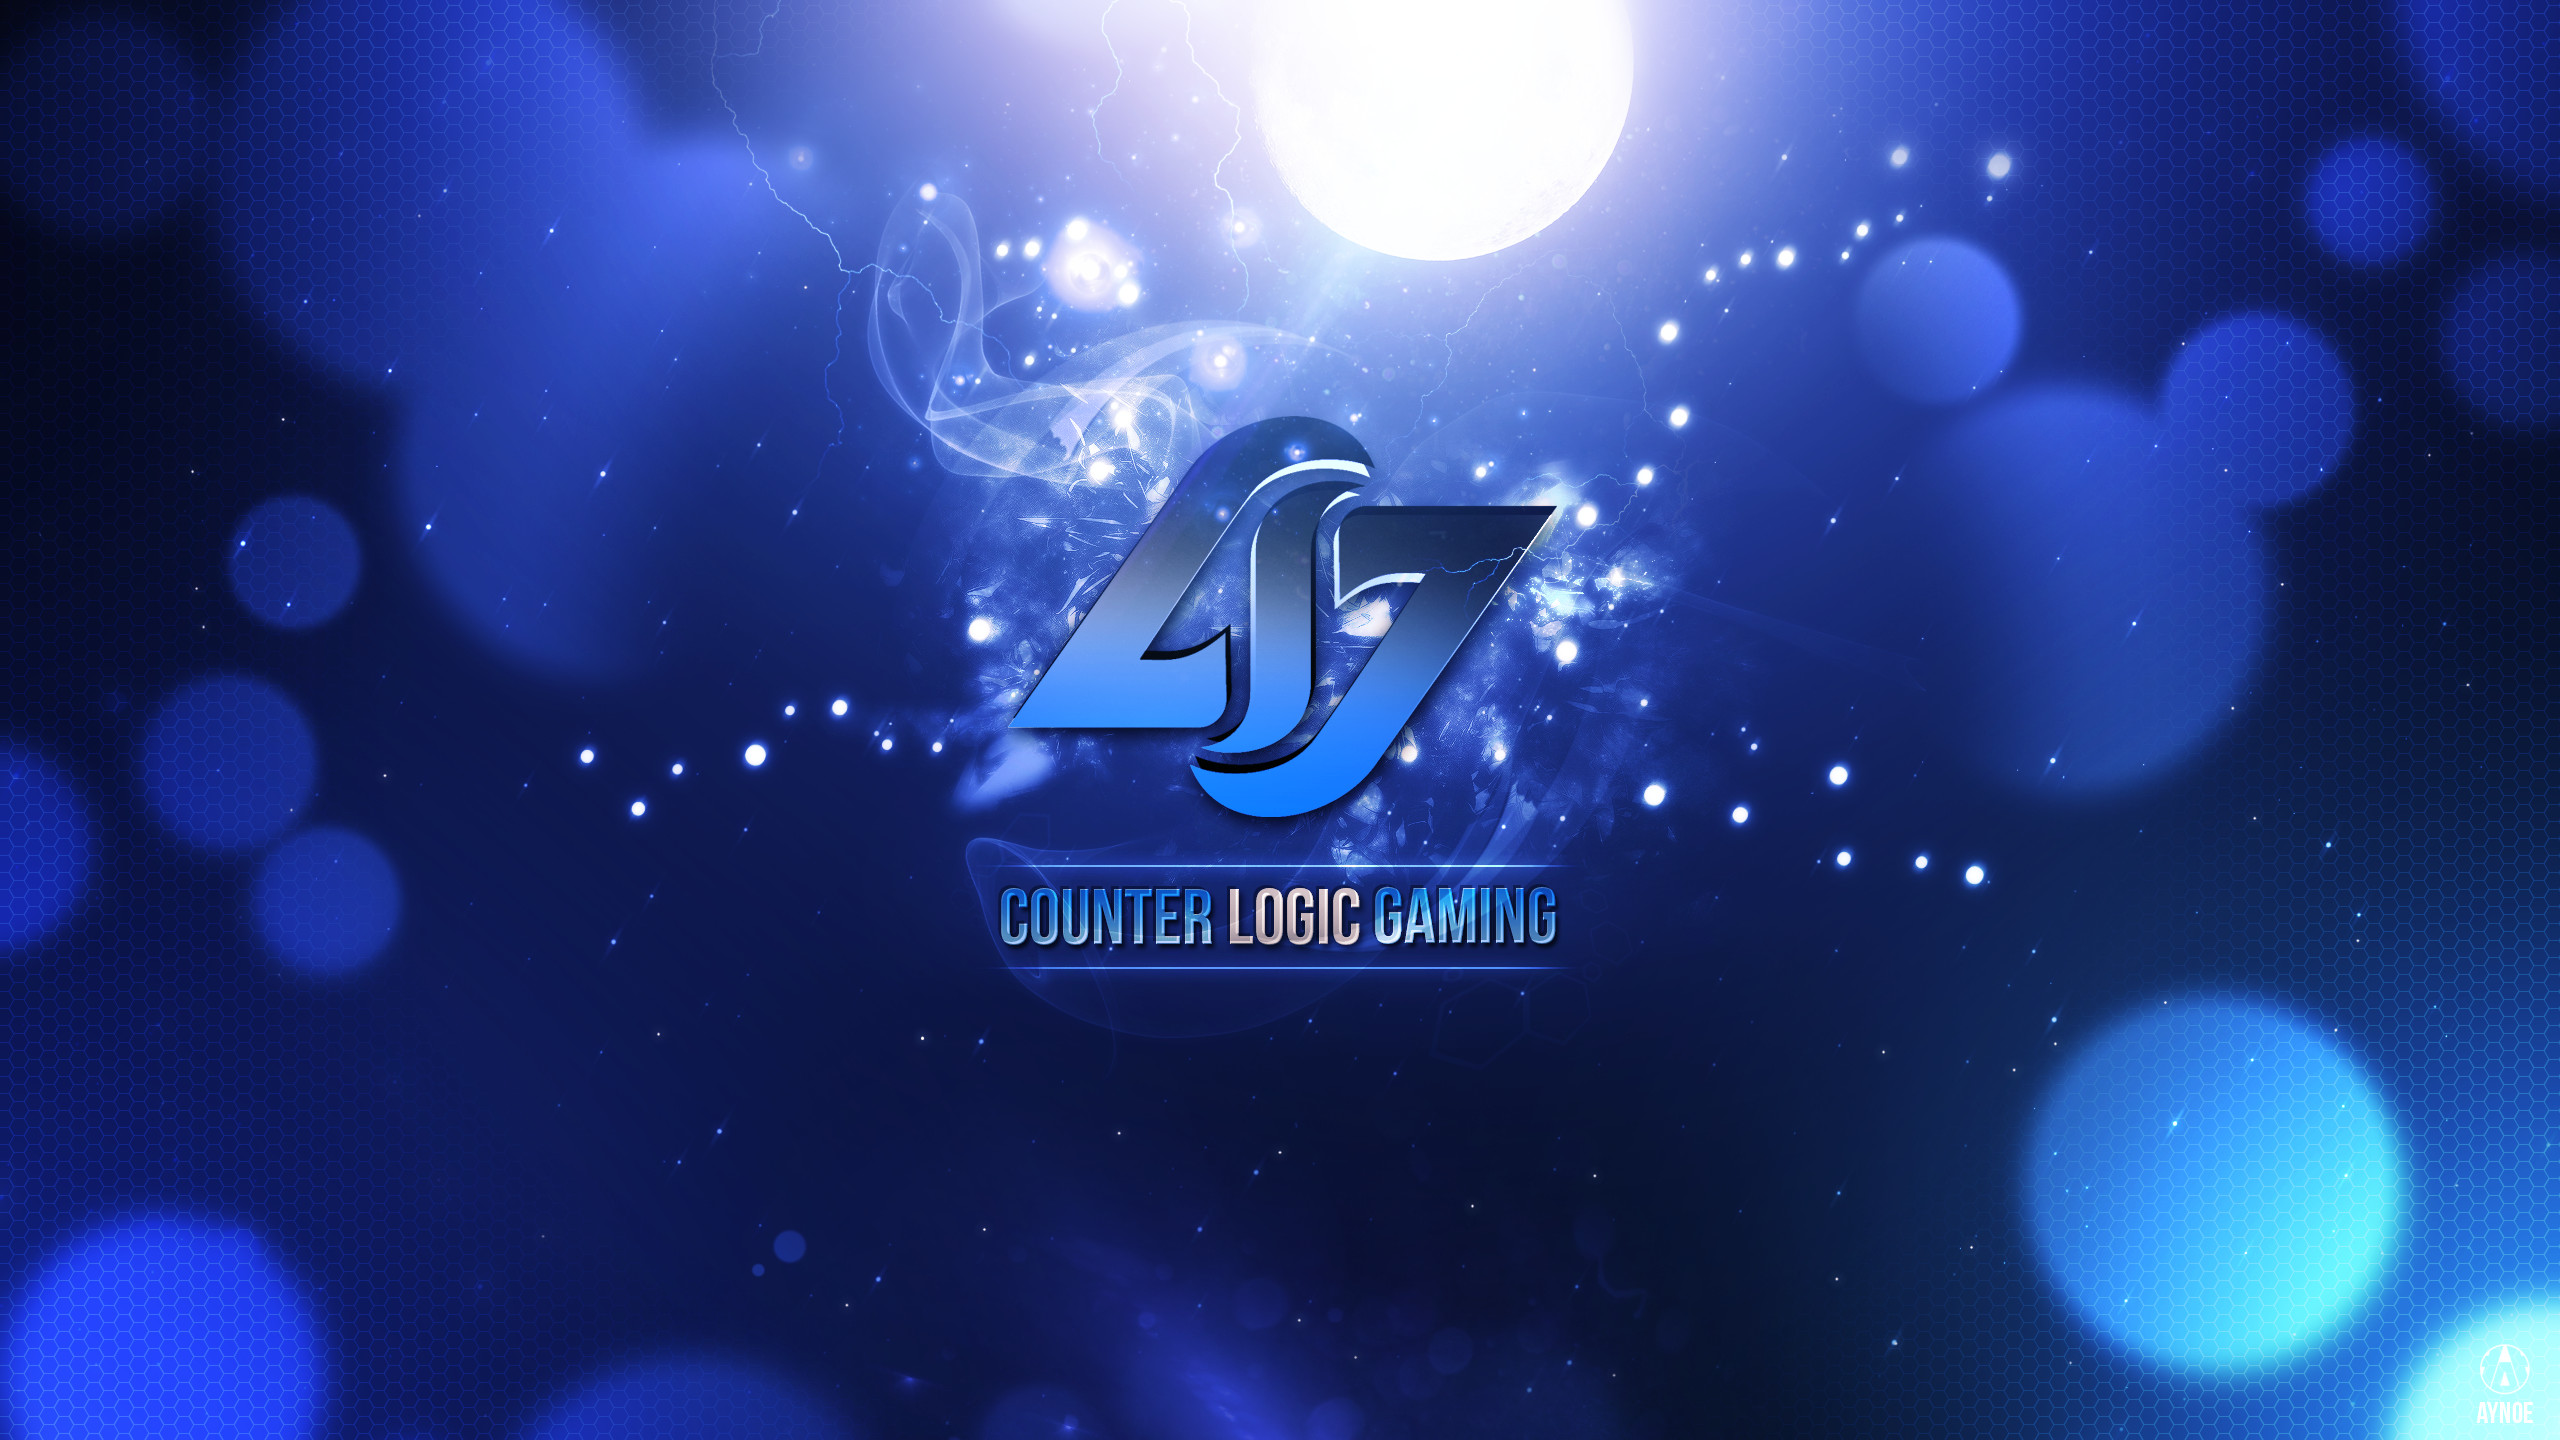 … CLG Wallpaper Logo – League of Legends – Dark one by Aynoe